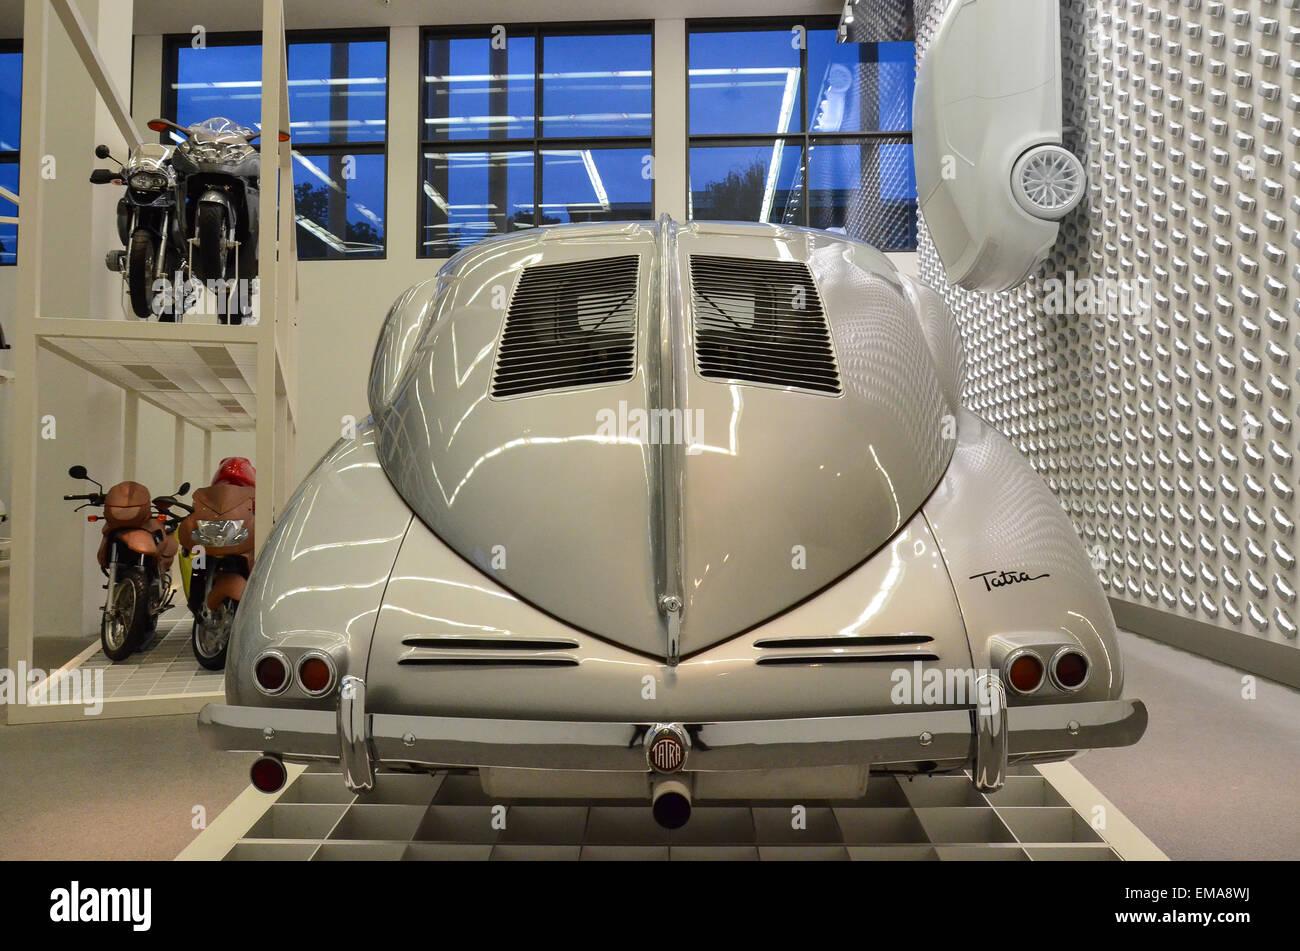 The Tatra 87 was a car built by Czechoslovak manufacturer Tatra. Still impressive with its futuristic car design! Stock Photo